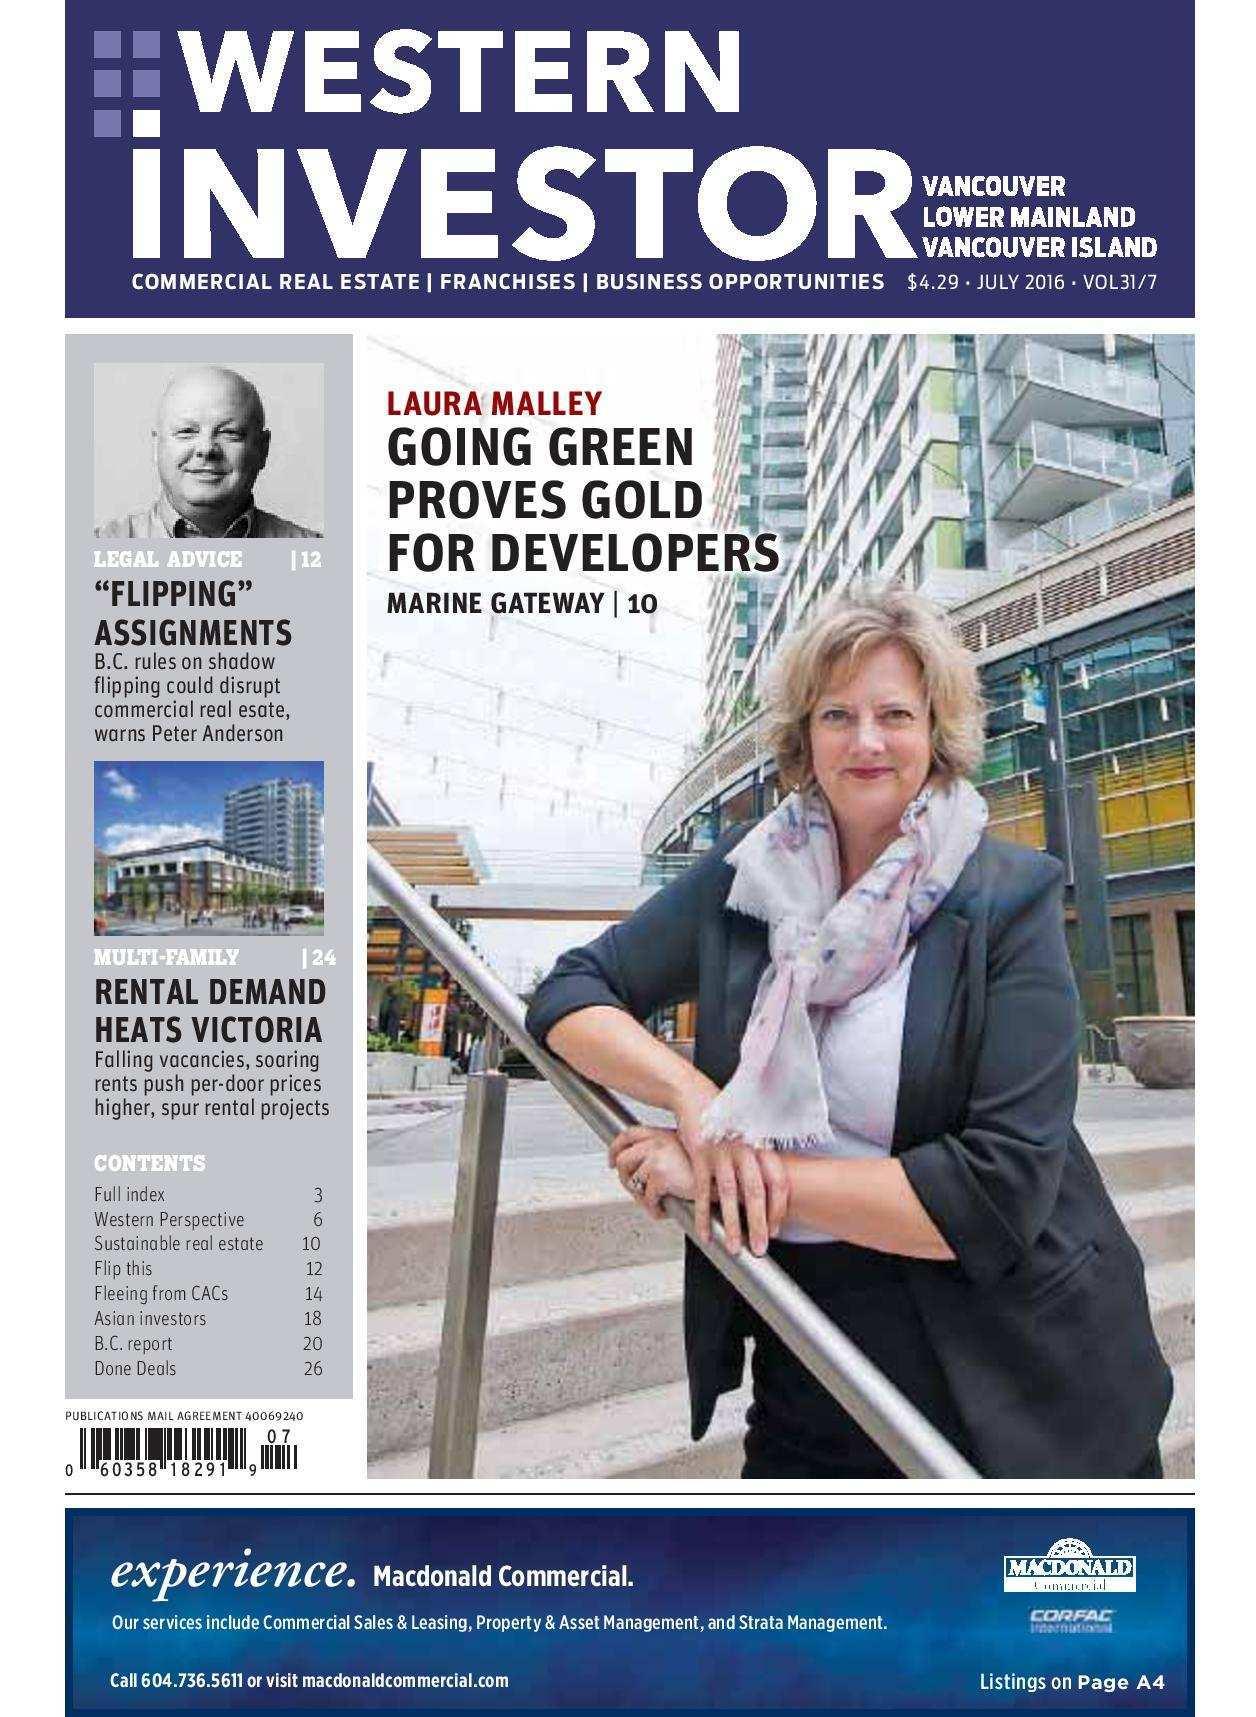 Press Release: Western Investor Ad – Jul 2016